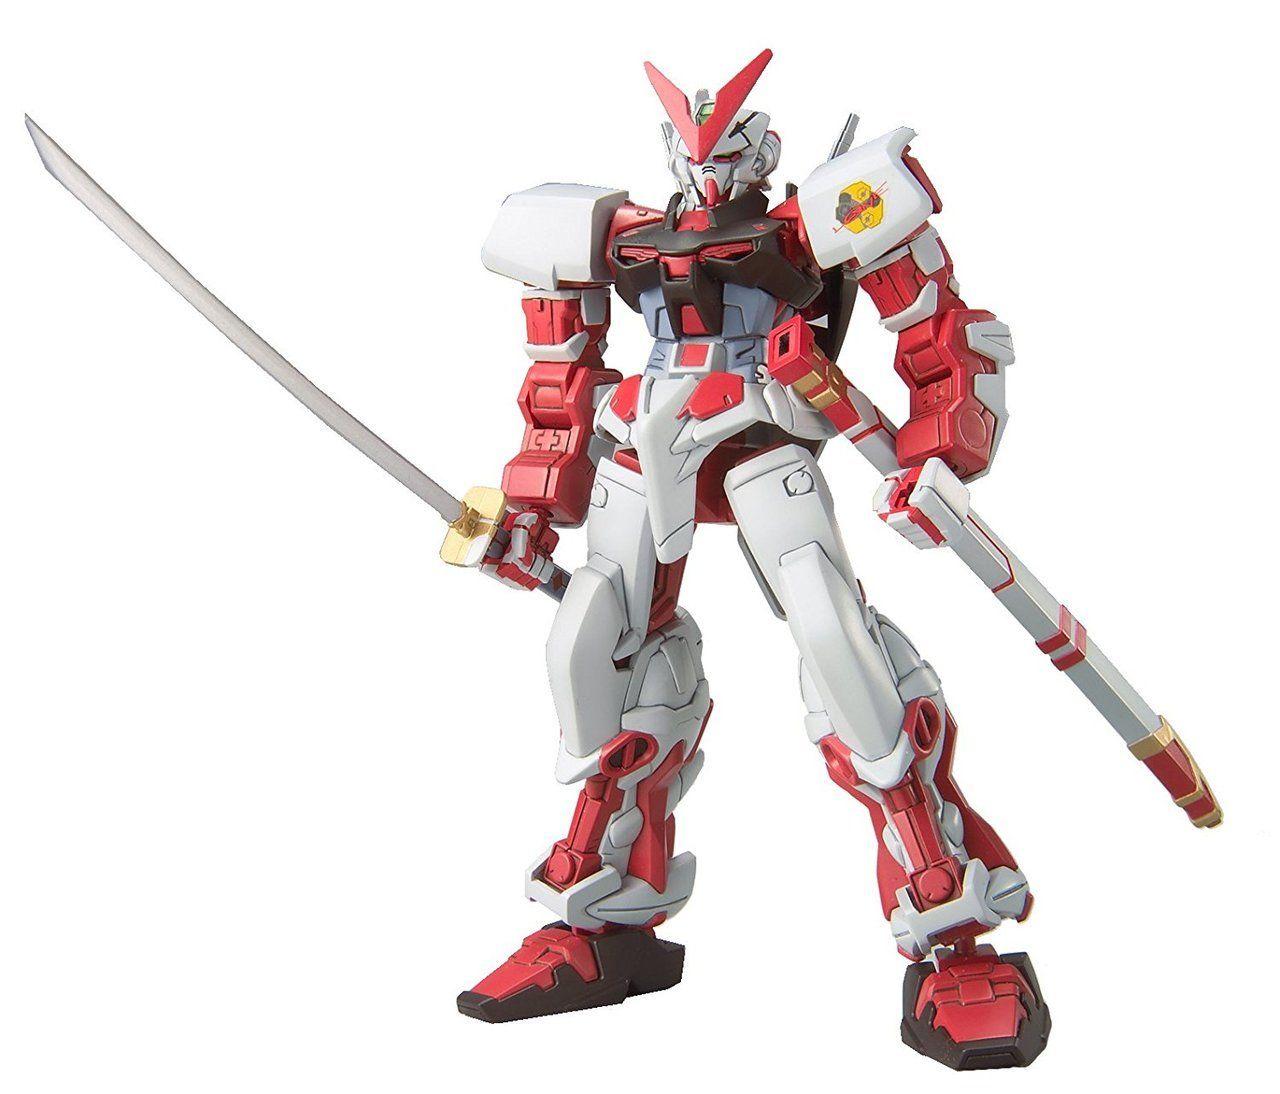 HG 1/144 MBF-P02 ガンダムアストレイ レッドフレーム [Gundam Astray Red Frame]